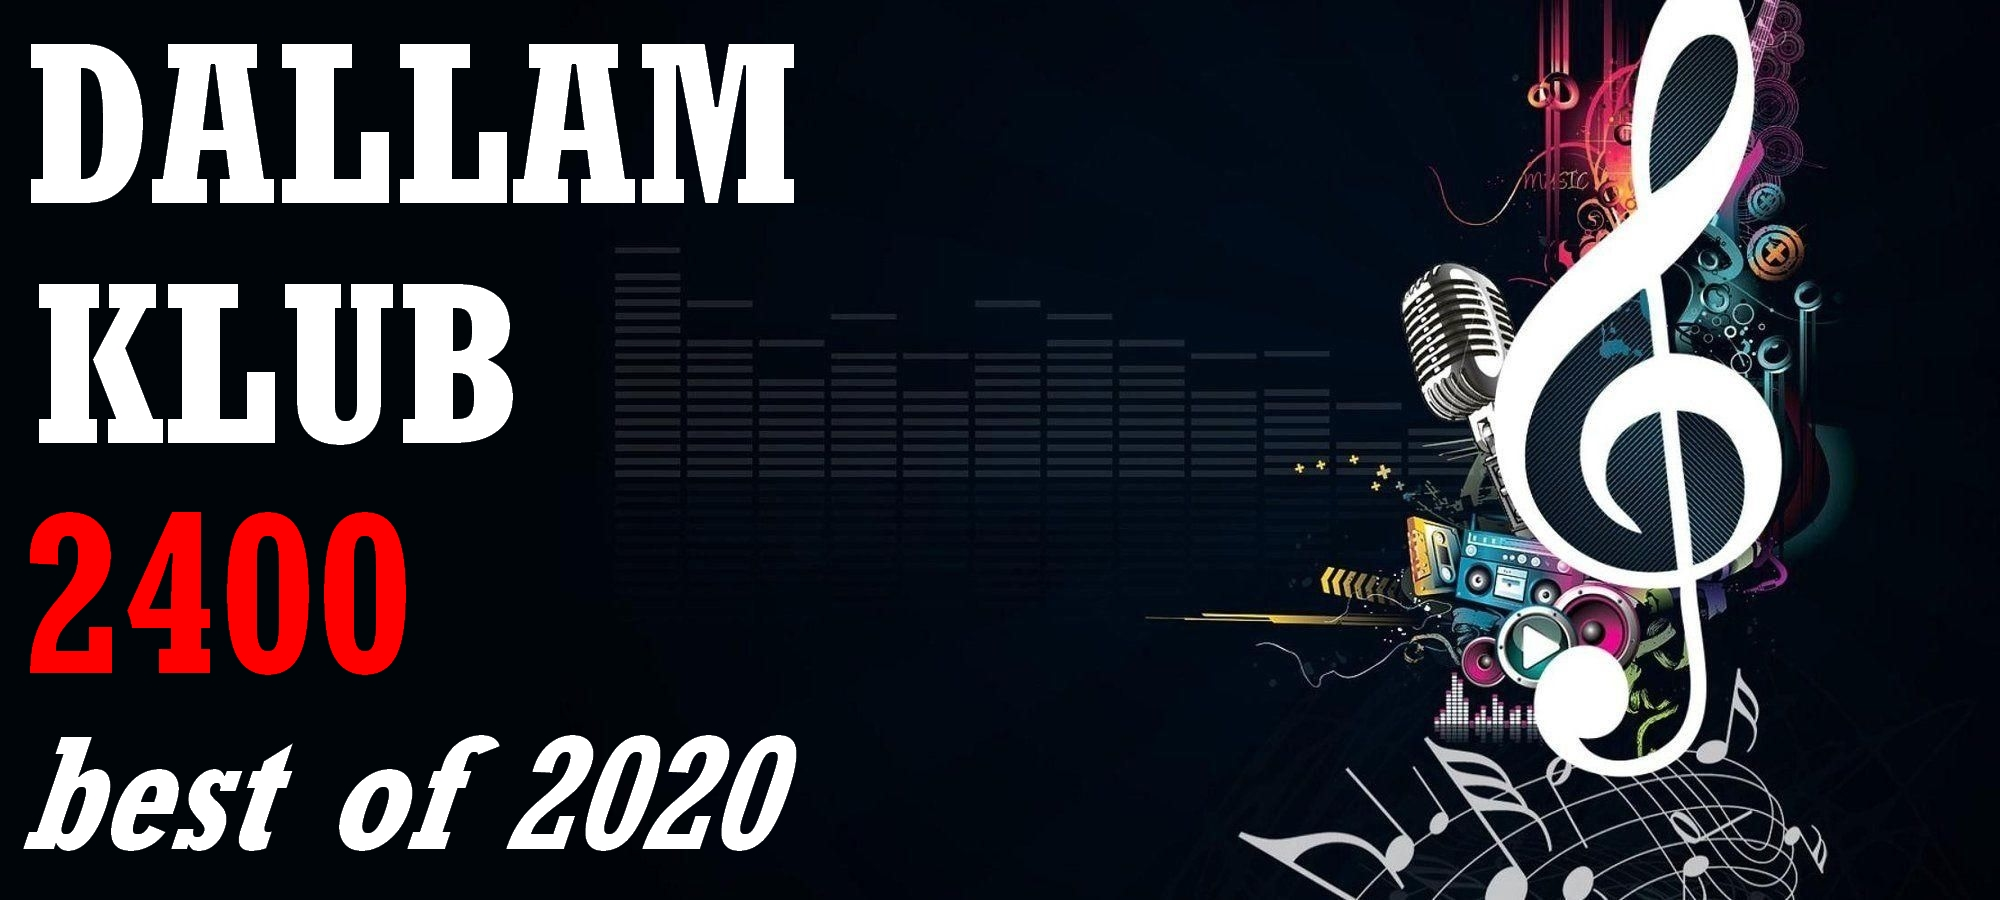 Dallam Klub 2400 – Best of 2020